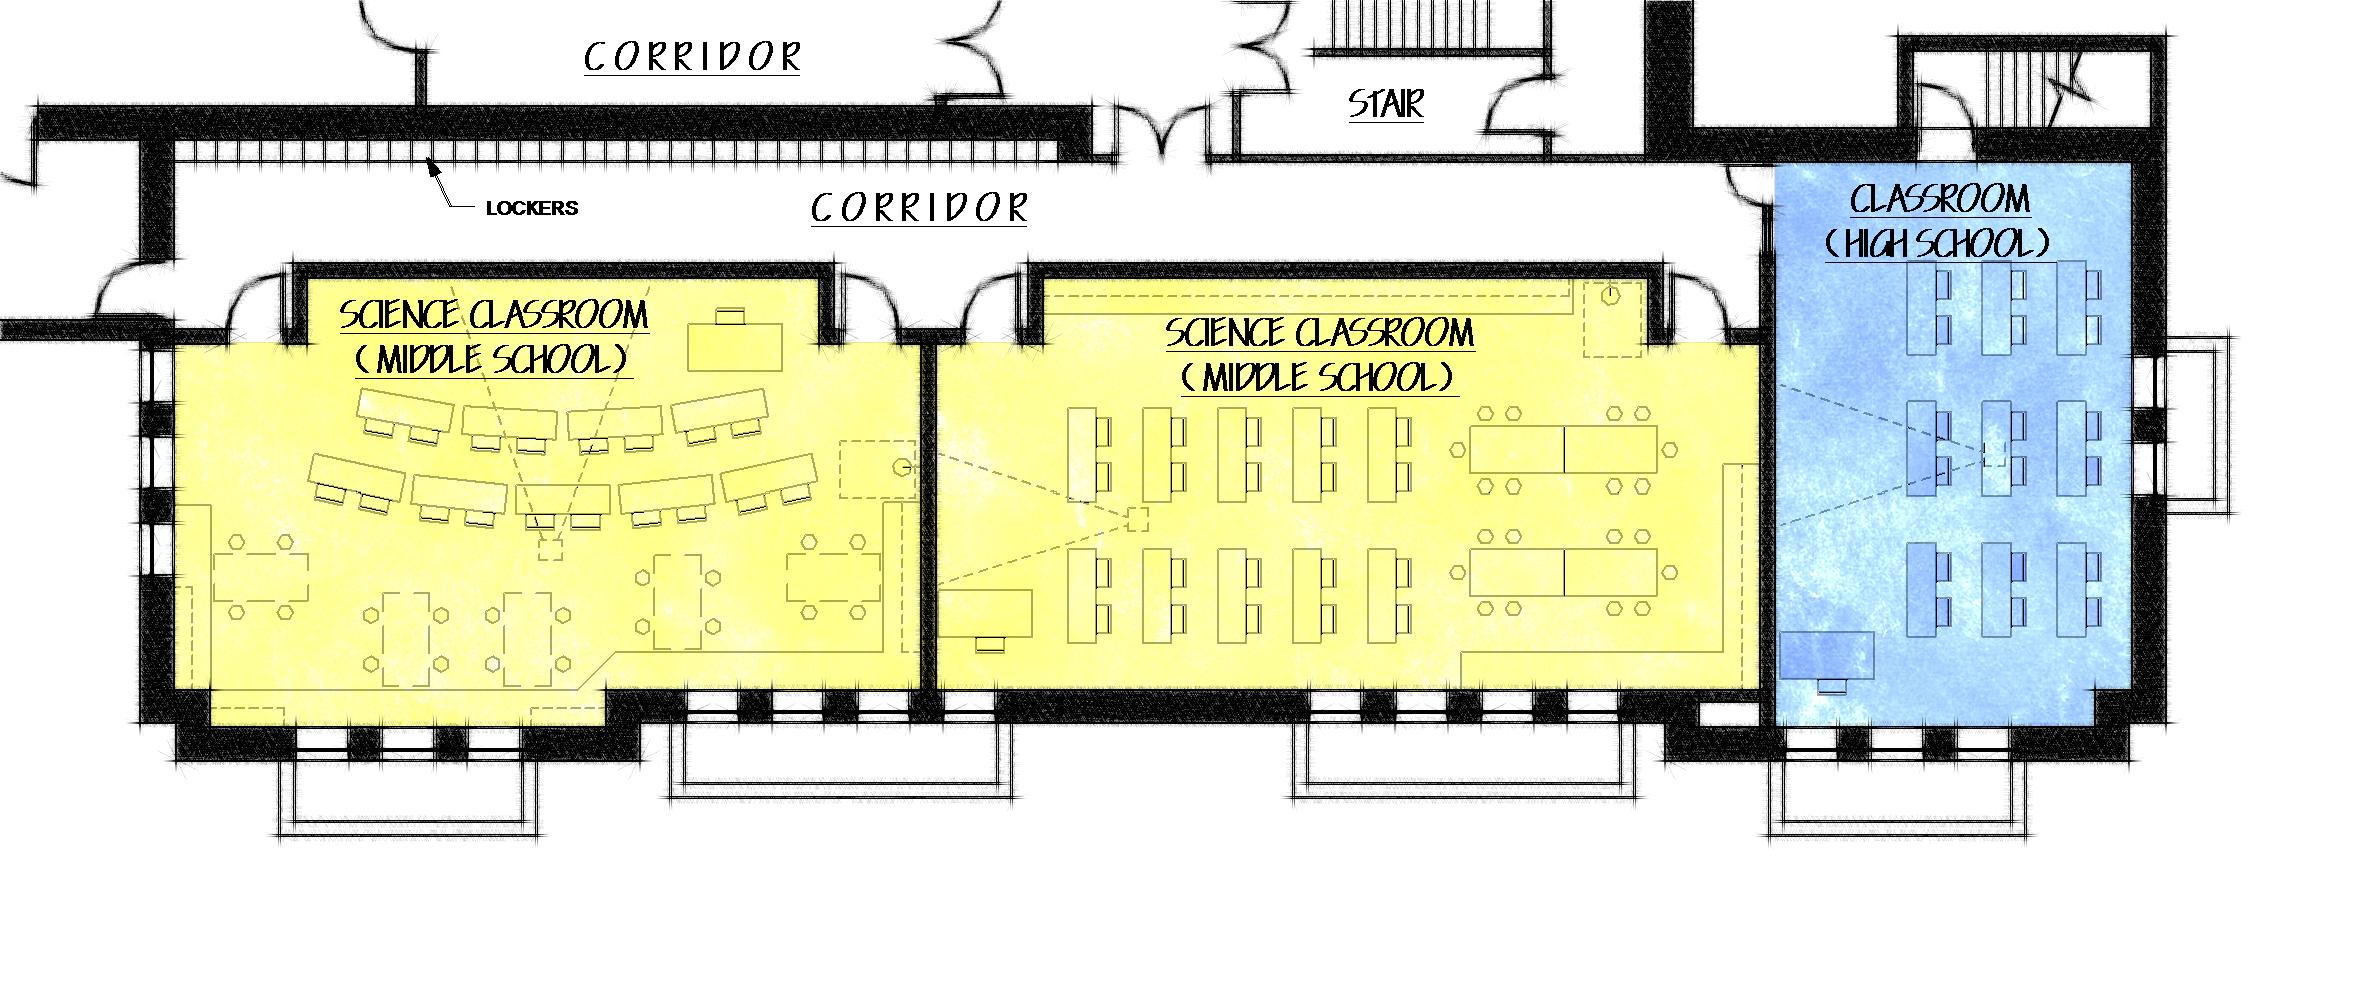 Middle School Science Floor Plan Ursuline Academy Celebrating